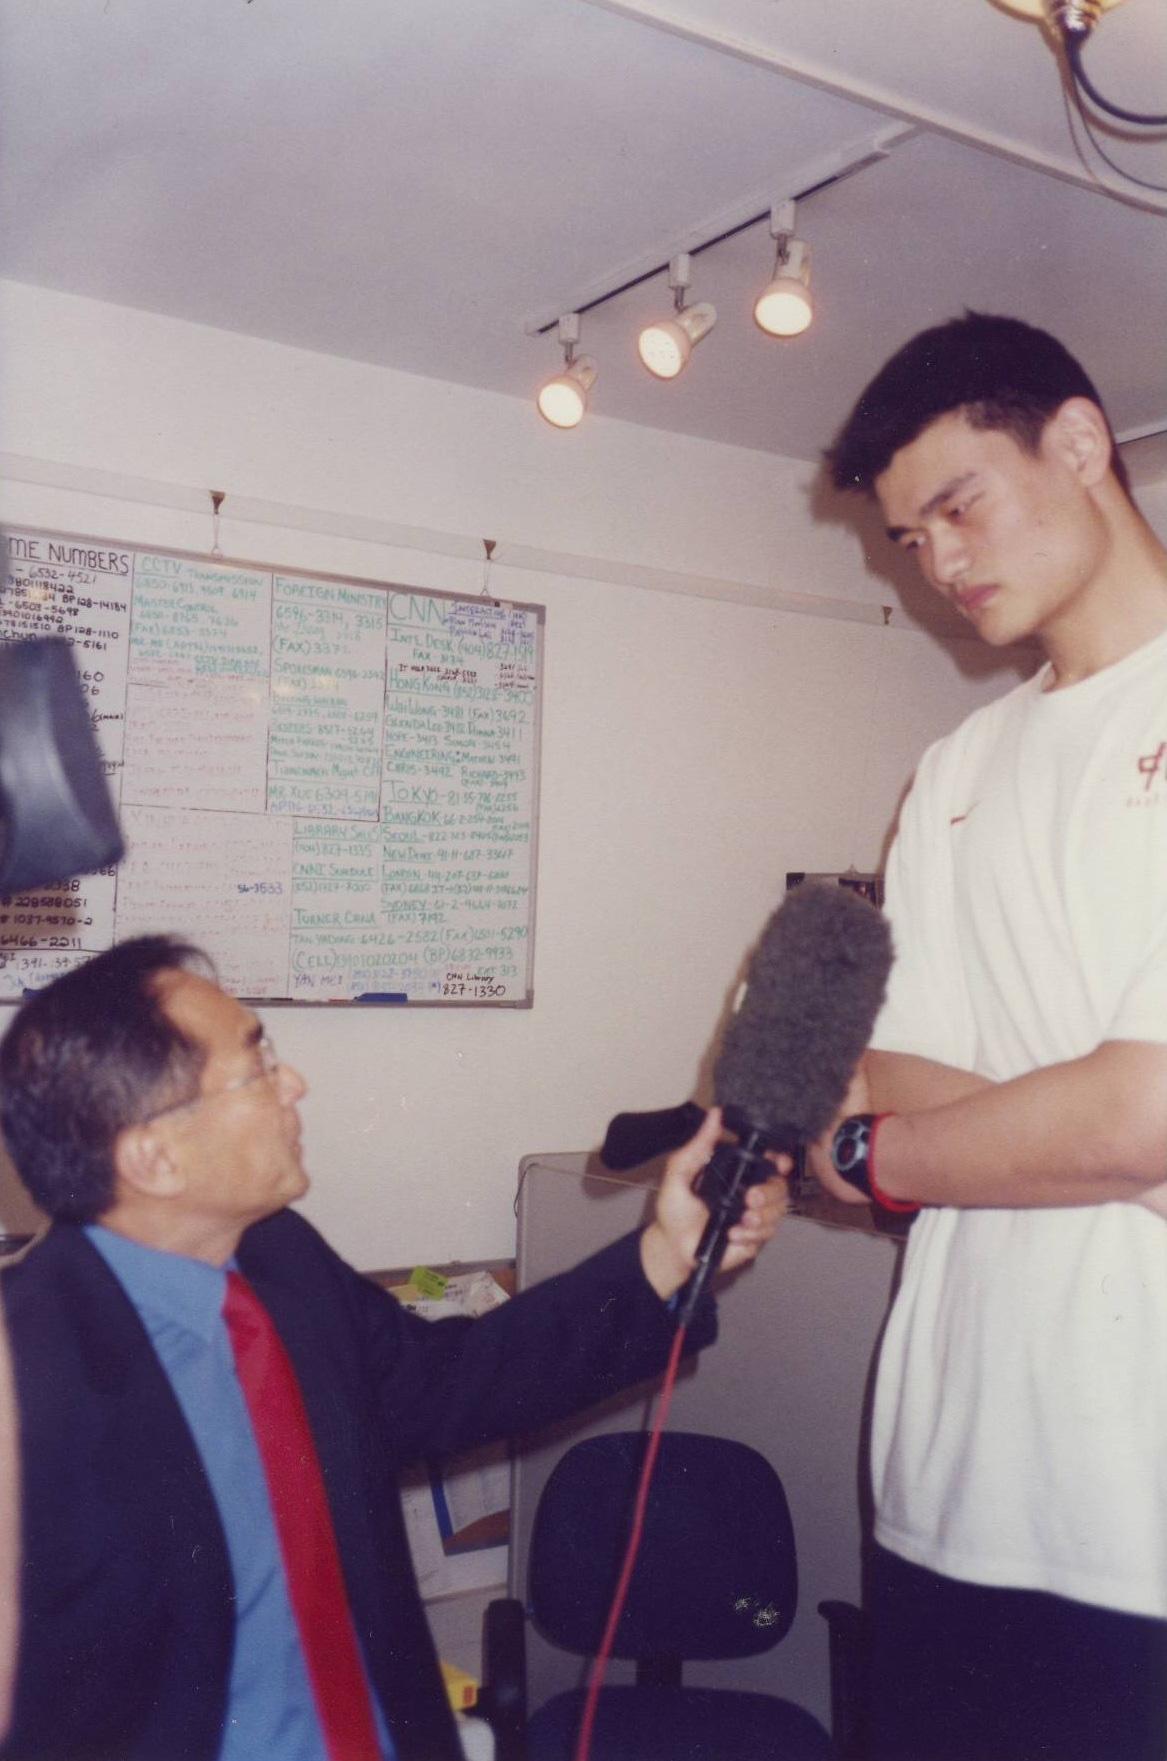 FlorCruz interviewing2002 NBANo.1draftpick YaoMing  (Photo courtesy of Jaime FlorCruz)